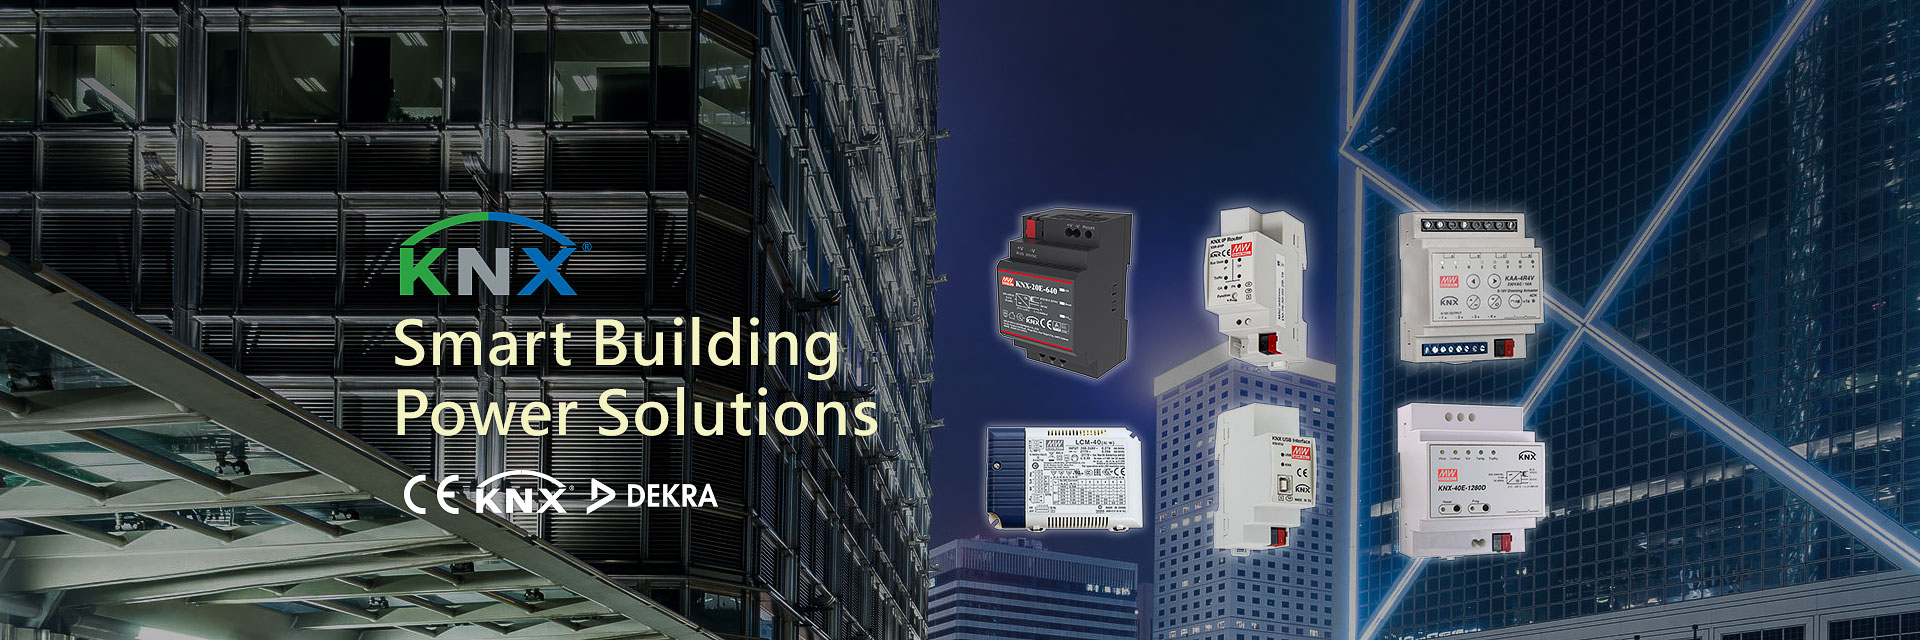 KNX Smart Building